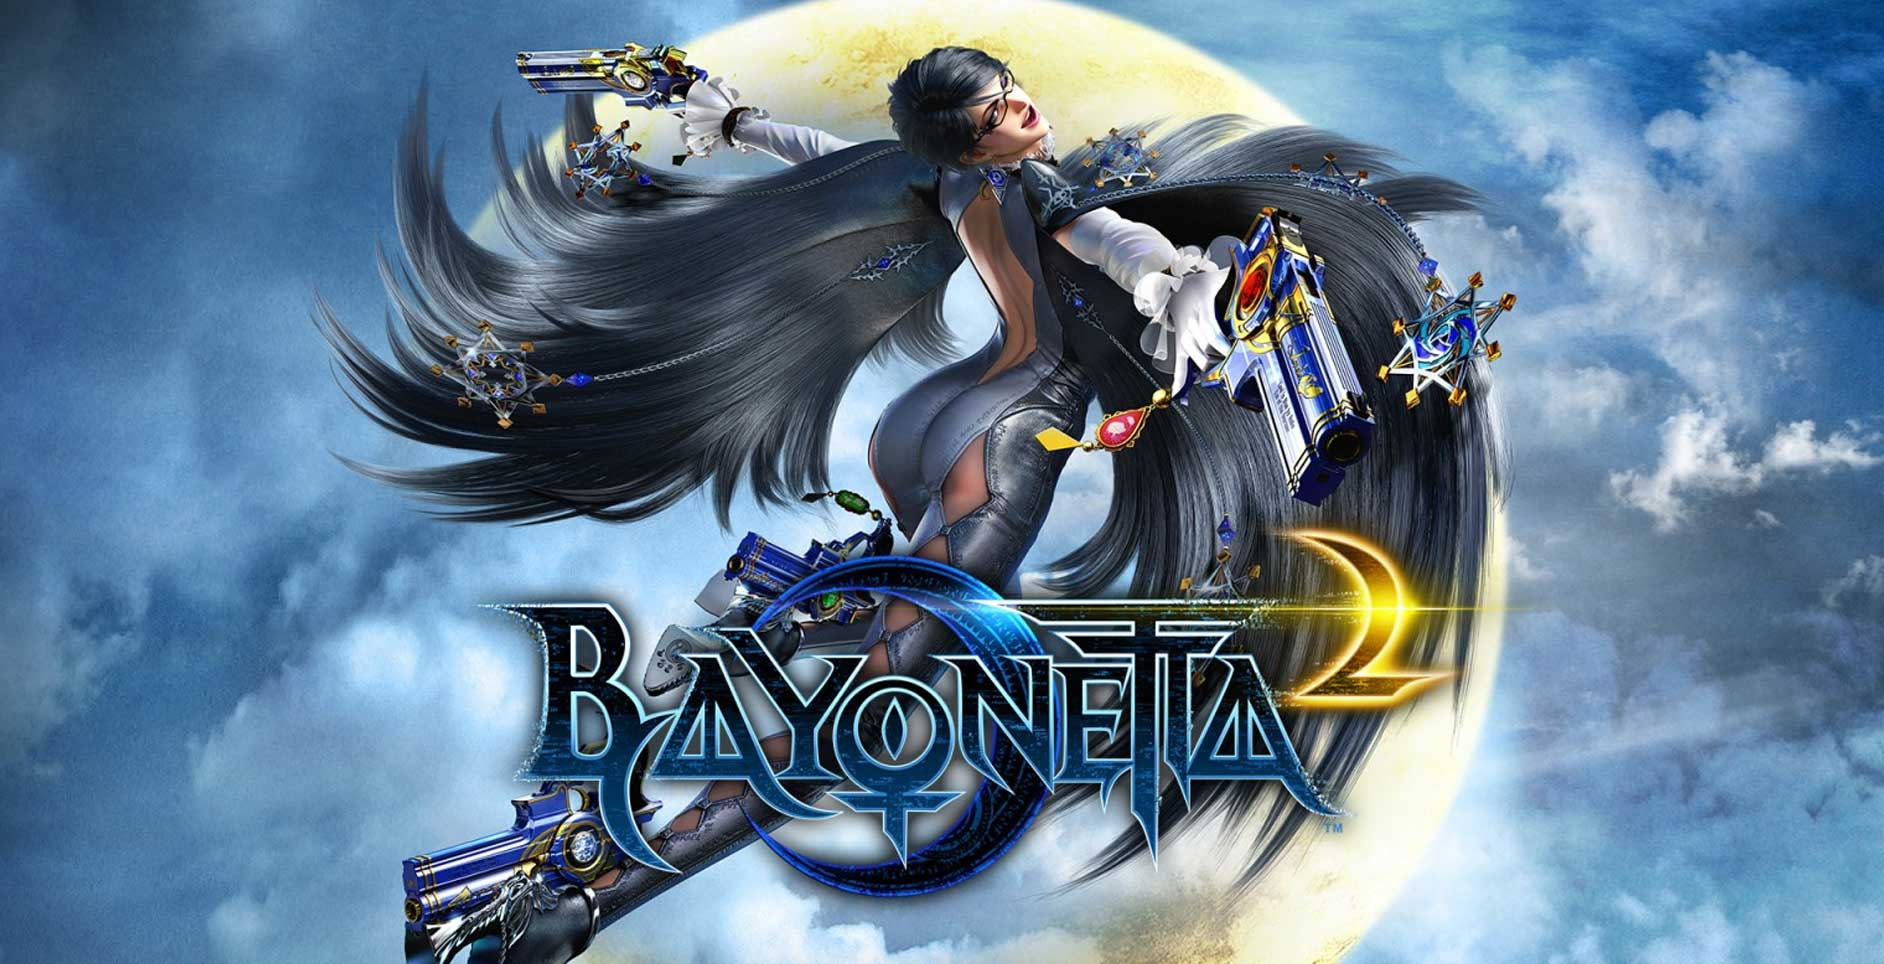 BAYONETTA-2-BARGAIN-GUIDE-NO-RED.jpg